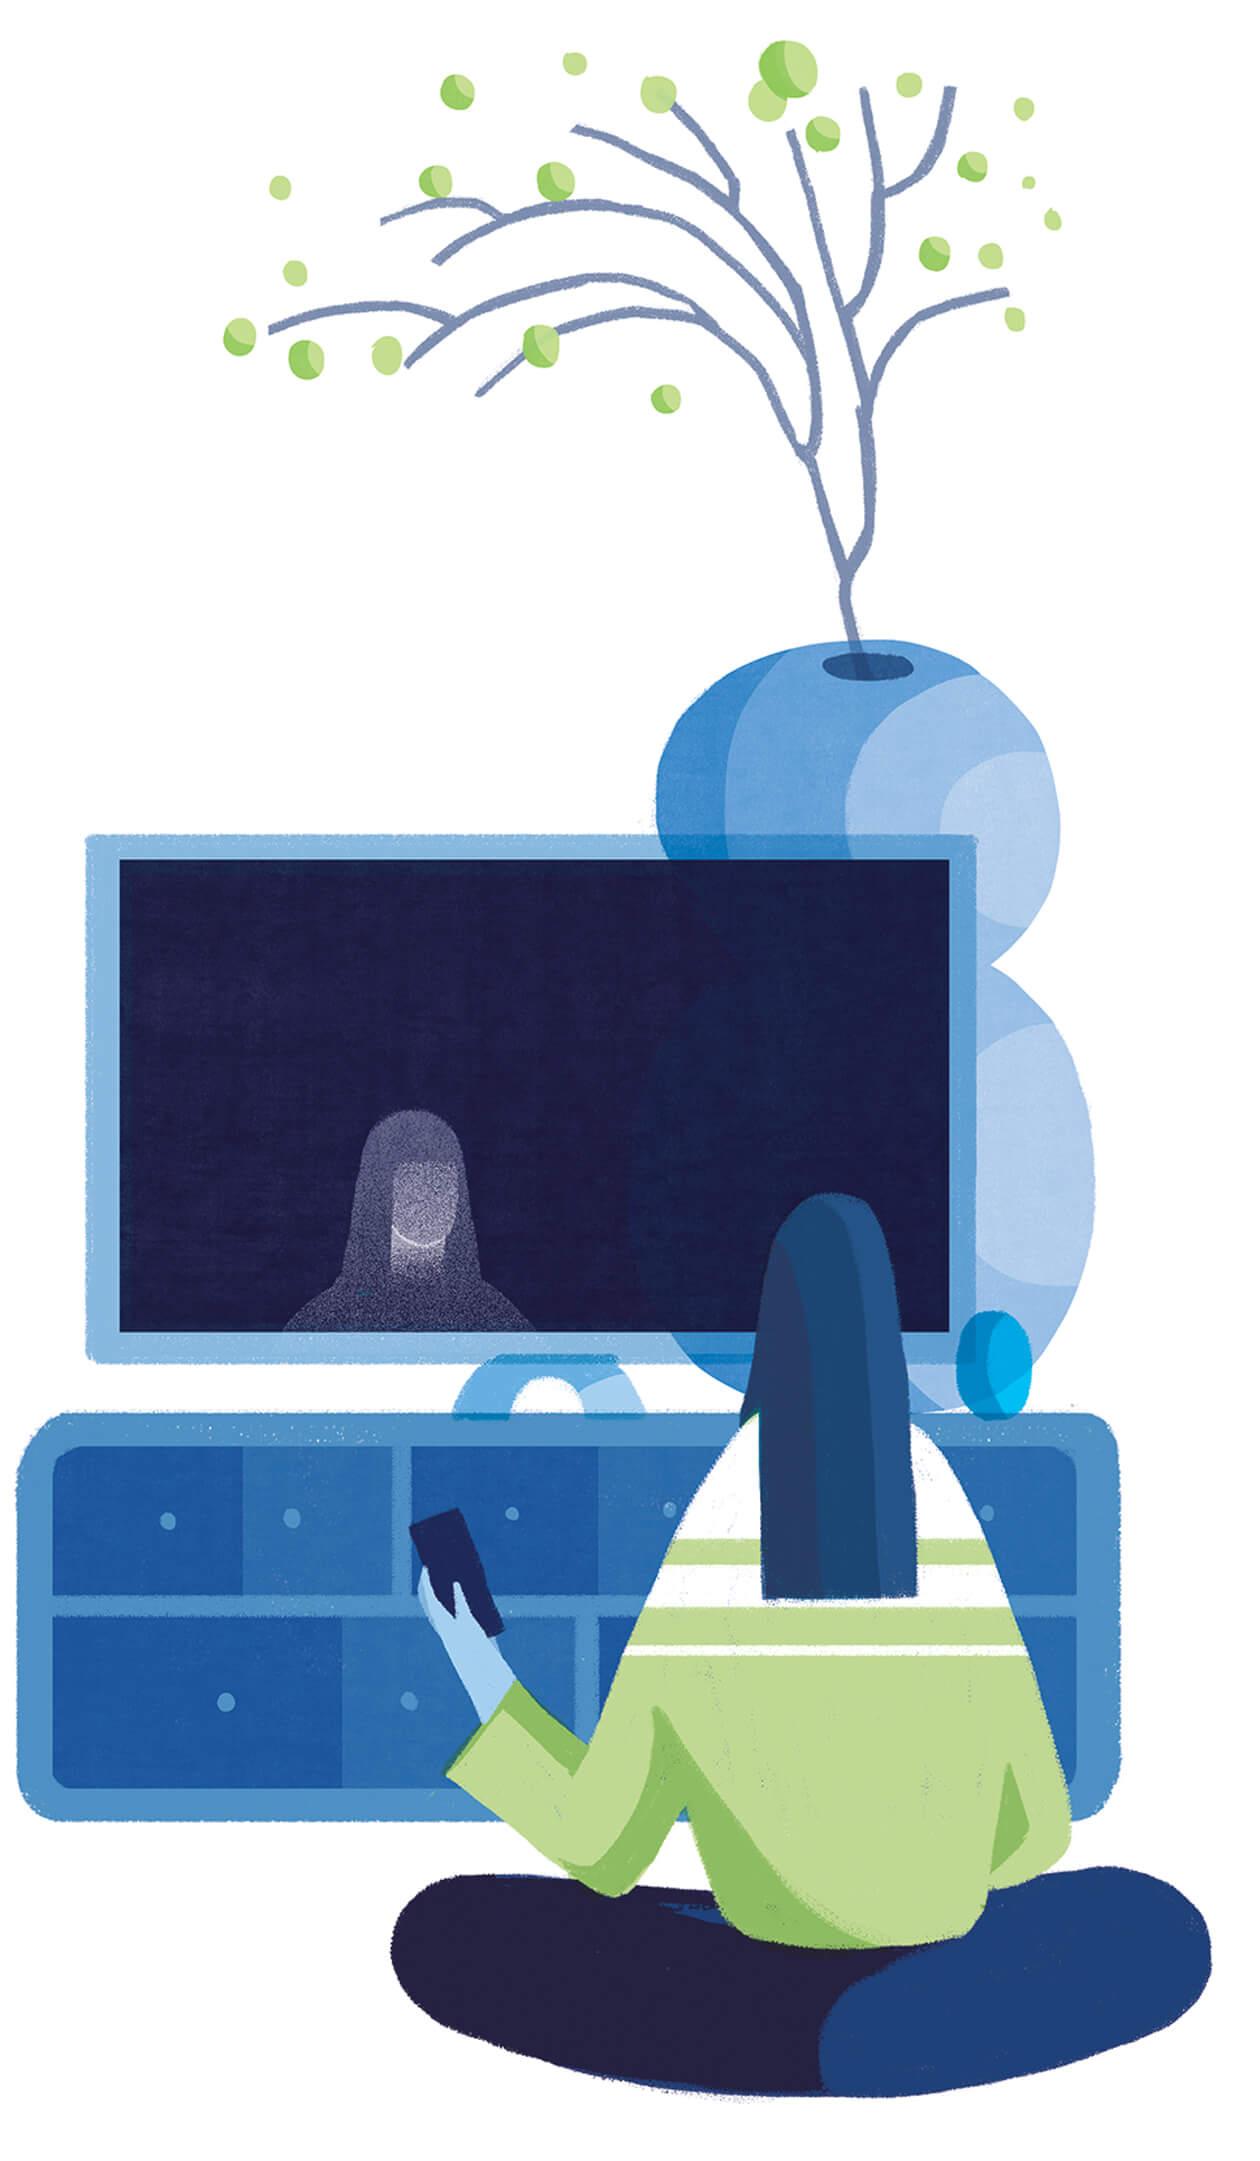 Illustration by Wenting Li